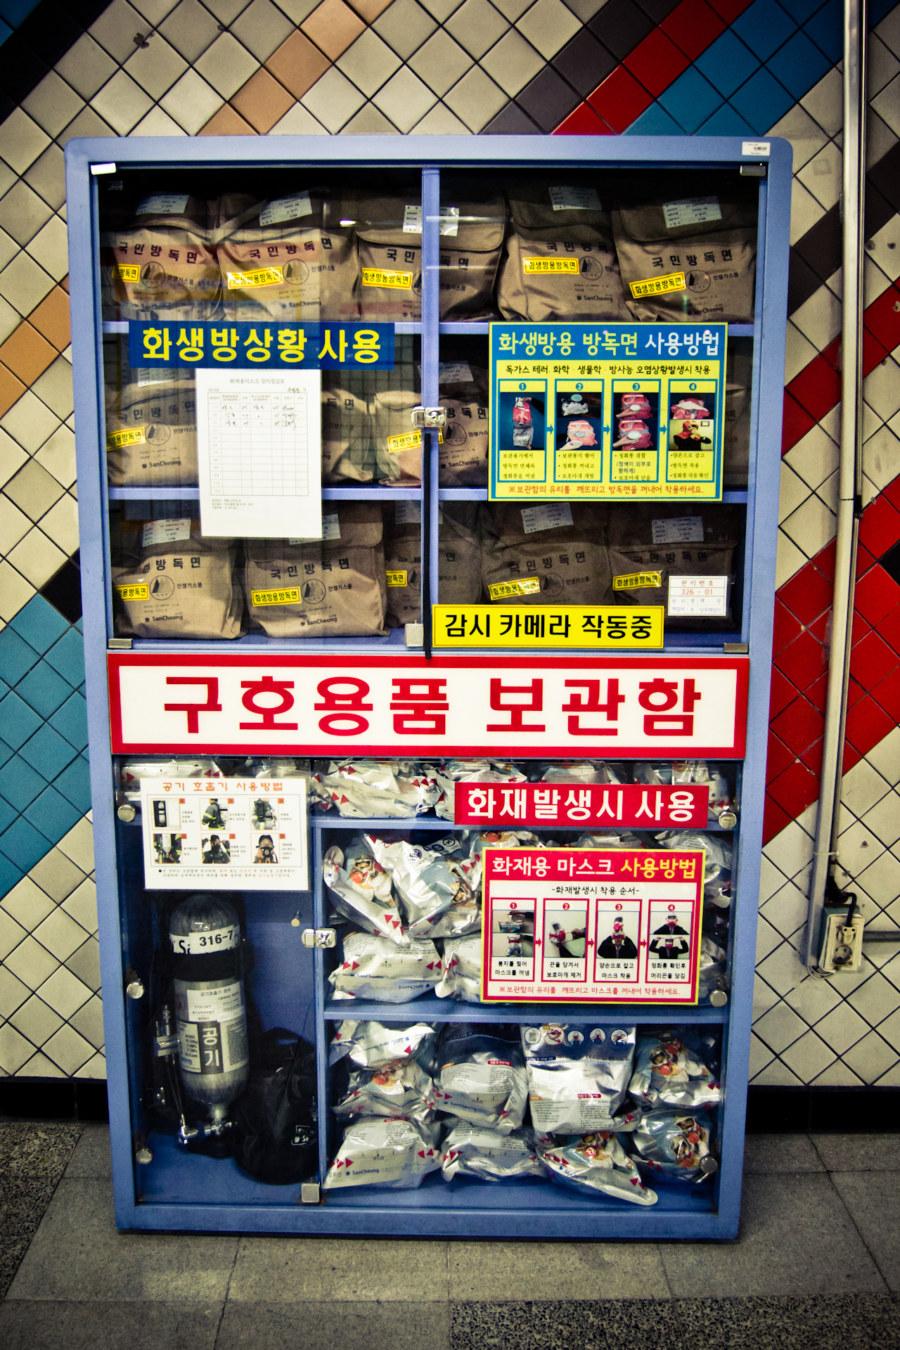 Seoul Metro Safety Station